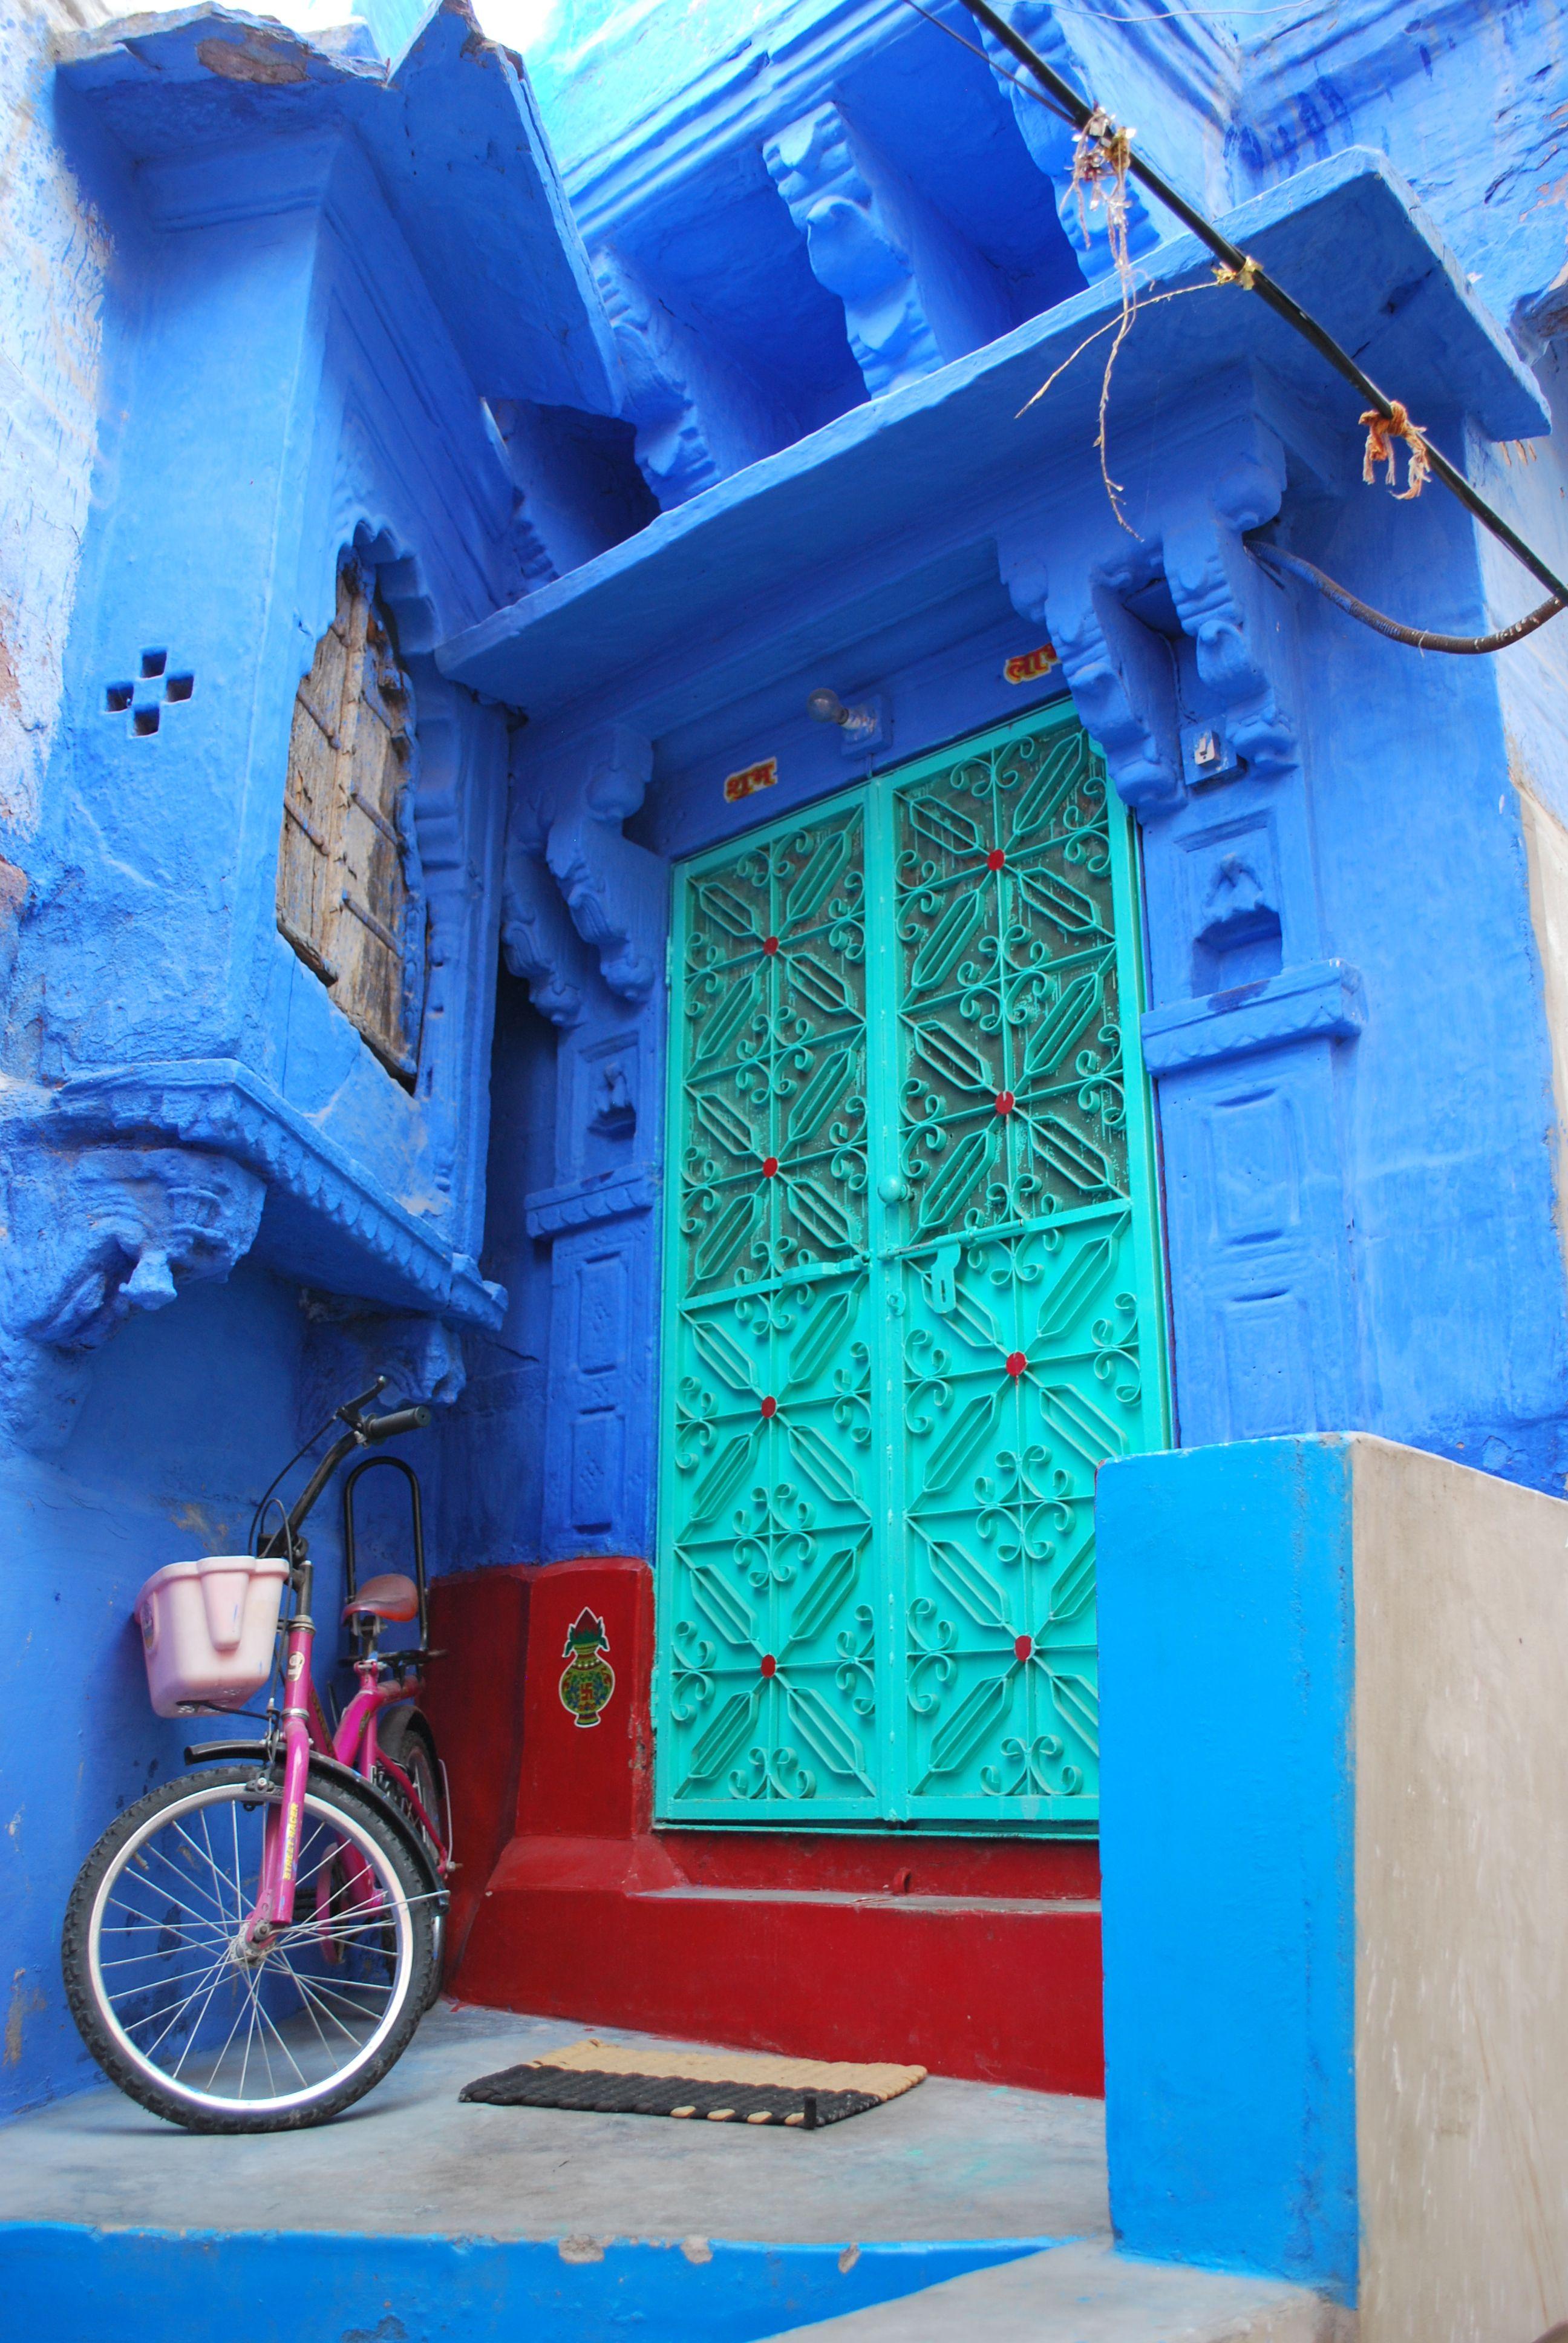 Muebles Nuryan San Luis Potosi - Blue City Jodhpur I N D I A Pinterest Jodhpur City And India[mjhdah]http://iwebhq.com/estar/wp-content/uploads/2014/11/hotdeal1shanghai-423022_1280.jpg